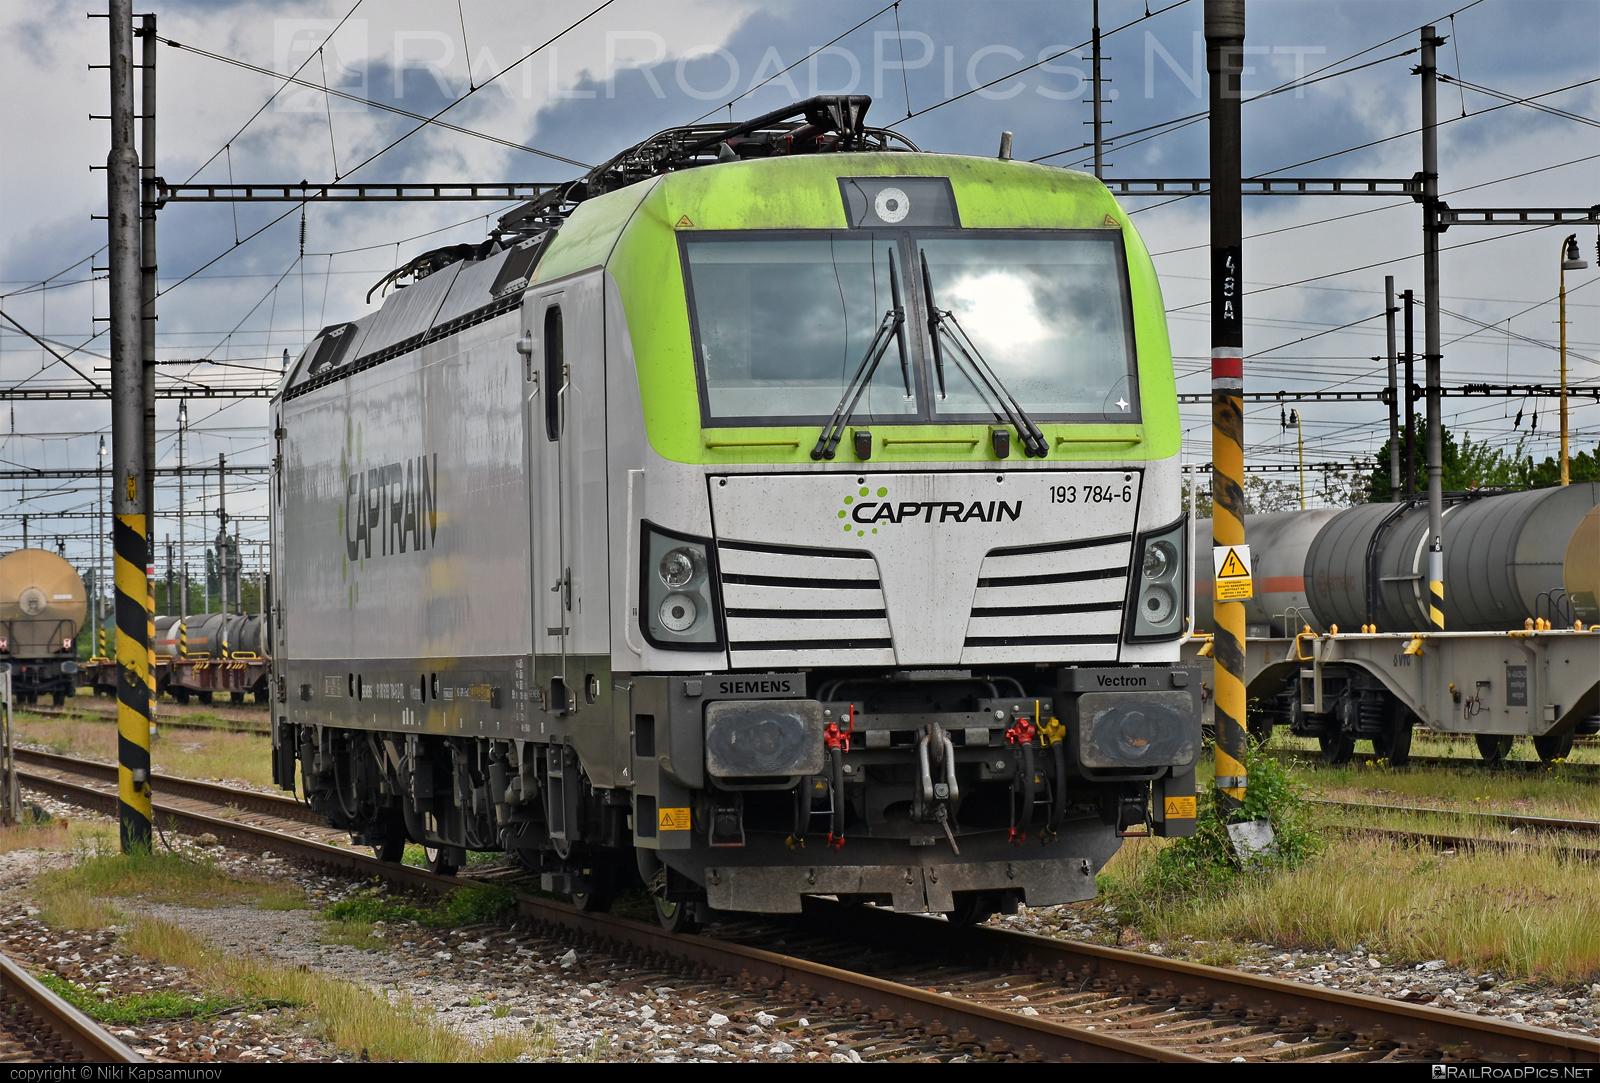 Siemens Vectron MS - 193 784-6 operated by LOKORAIL, a.s. #captrain #itl #itlEisenbahngesellschaft #lokorail #lrl #siemens #siemensvectron #siemensvectronms #vectron #vectronms